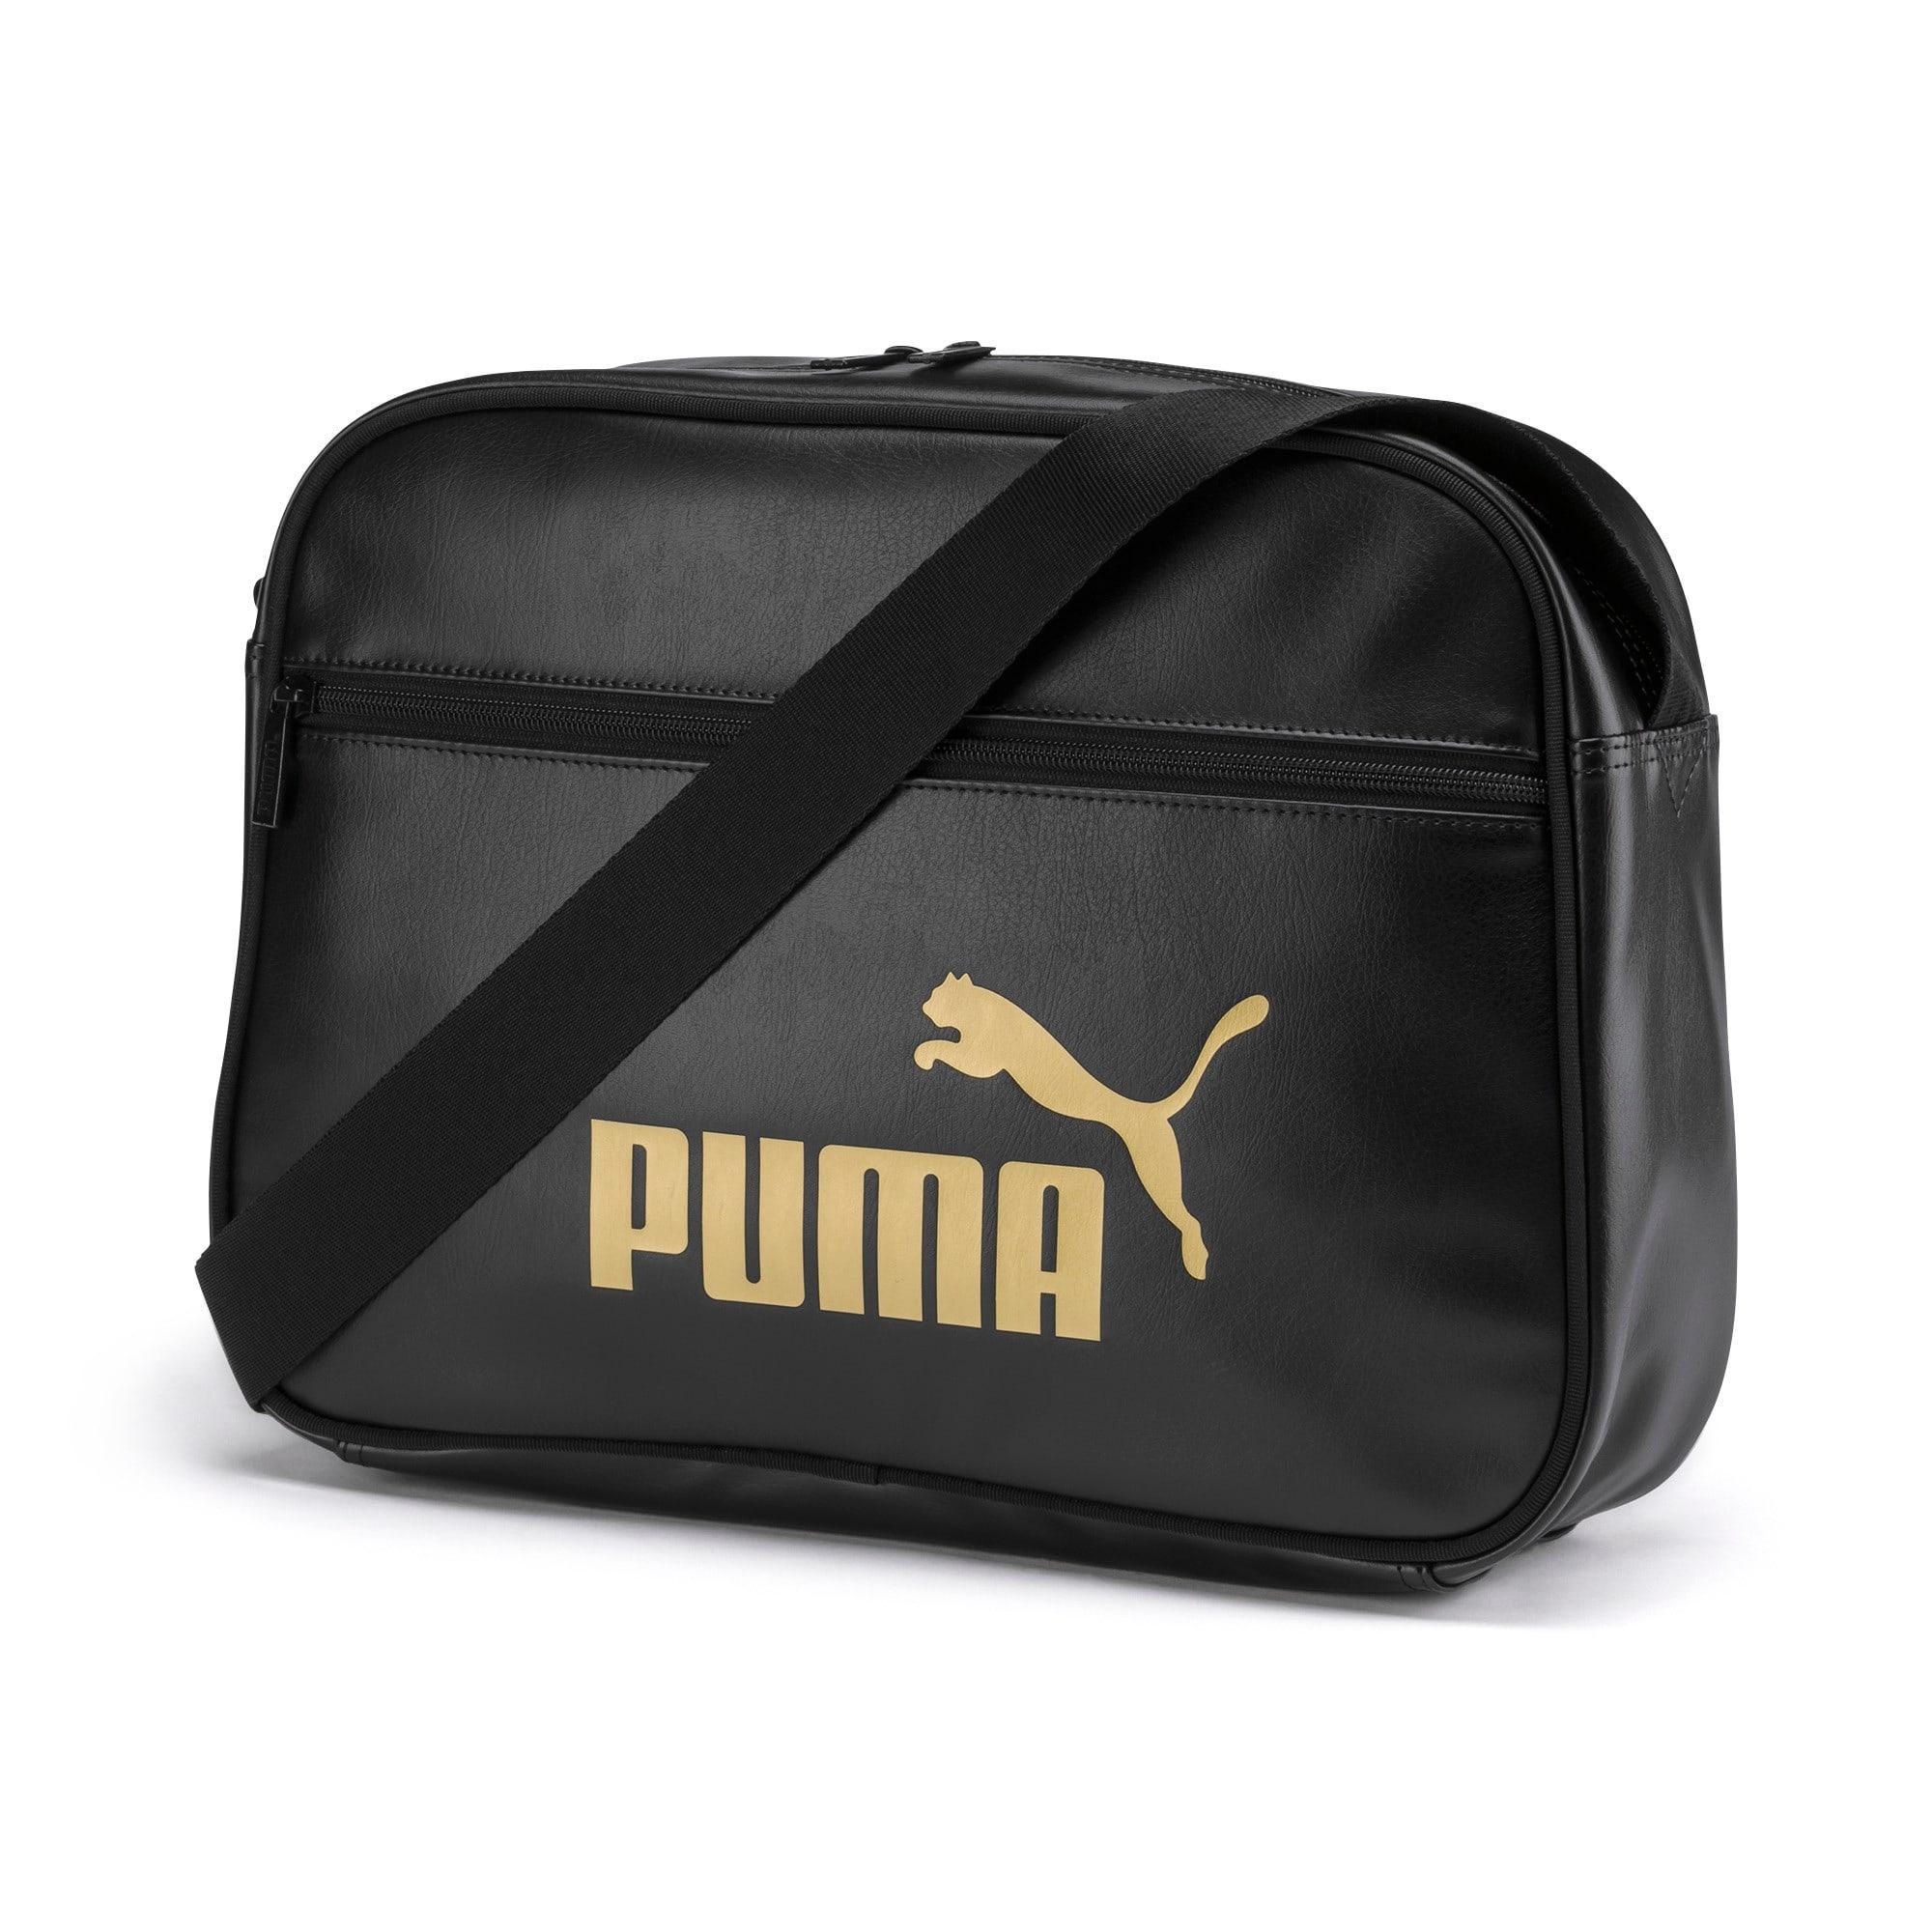 Thumbnail 1 of Core Up Reporter Bag, Puma Black-Gold, medium